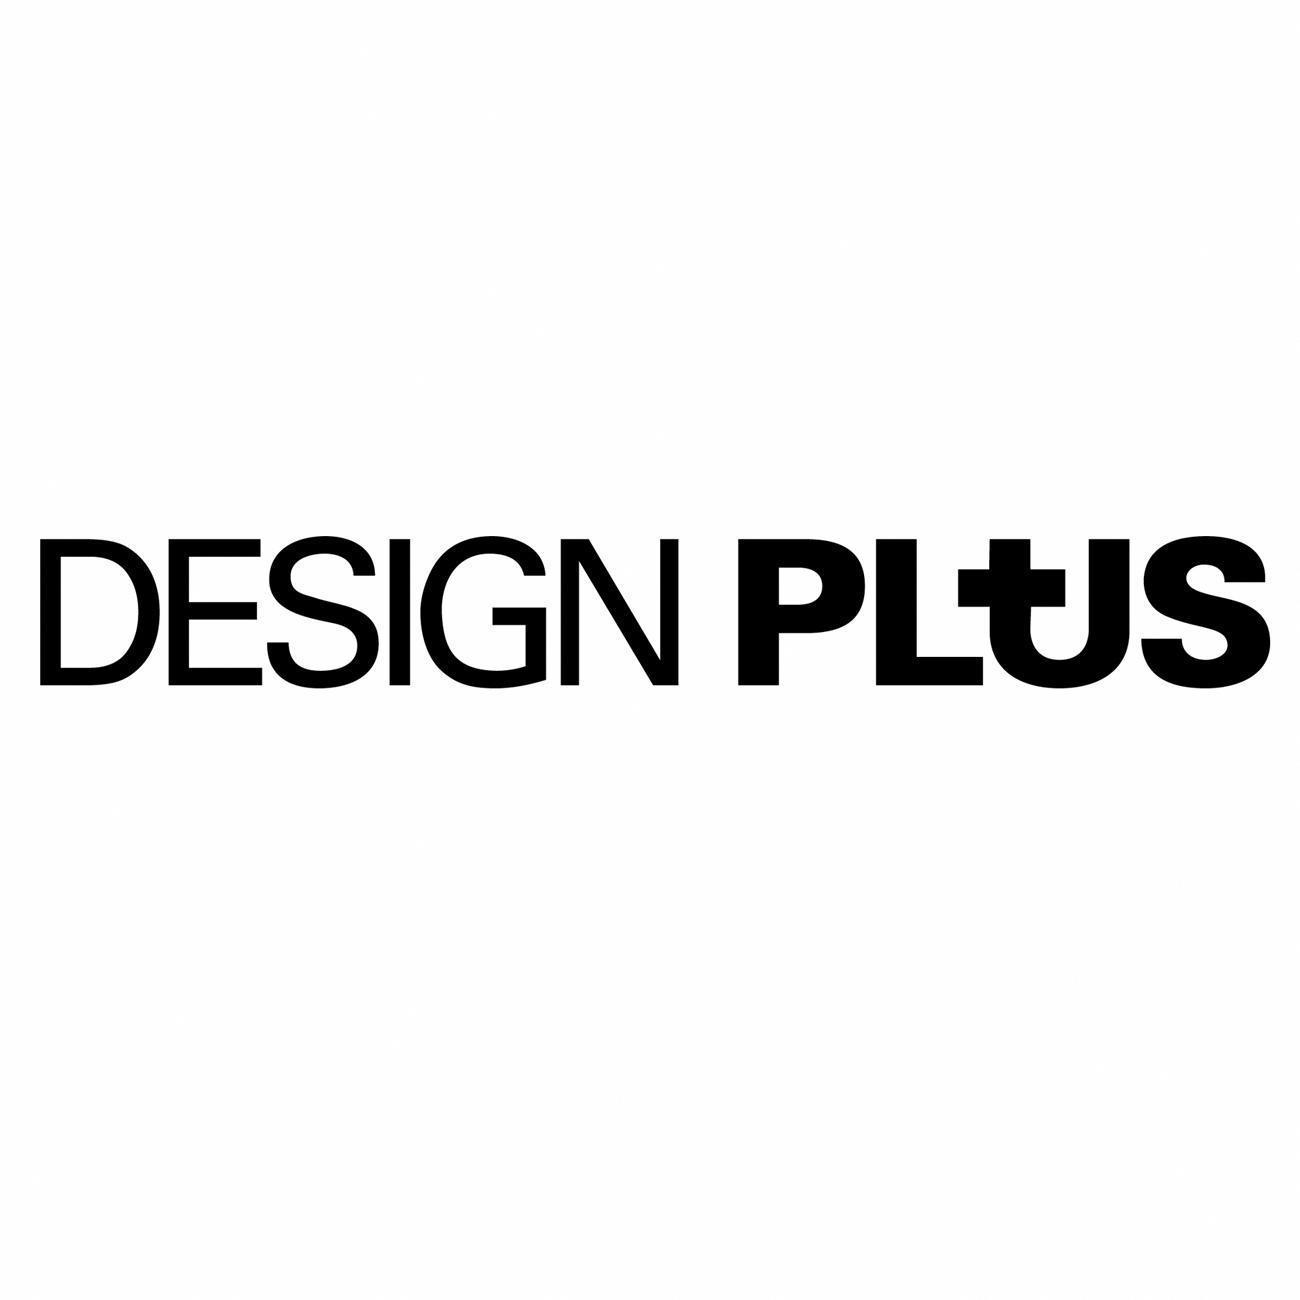 vogelglocke 2er set 3 jahre garantie pro idee. Black Bedroom Furniture Sets. Home Design Ideas